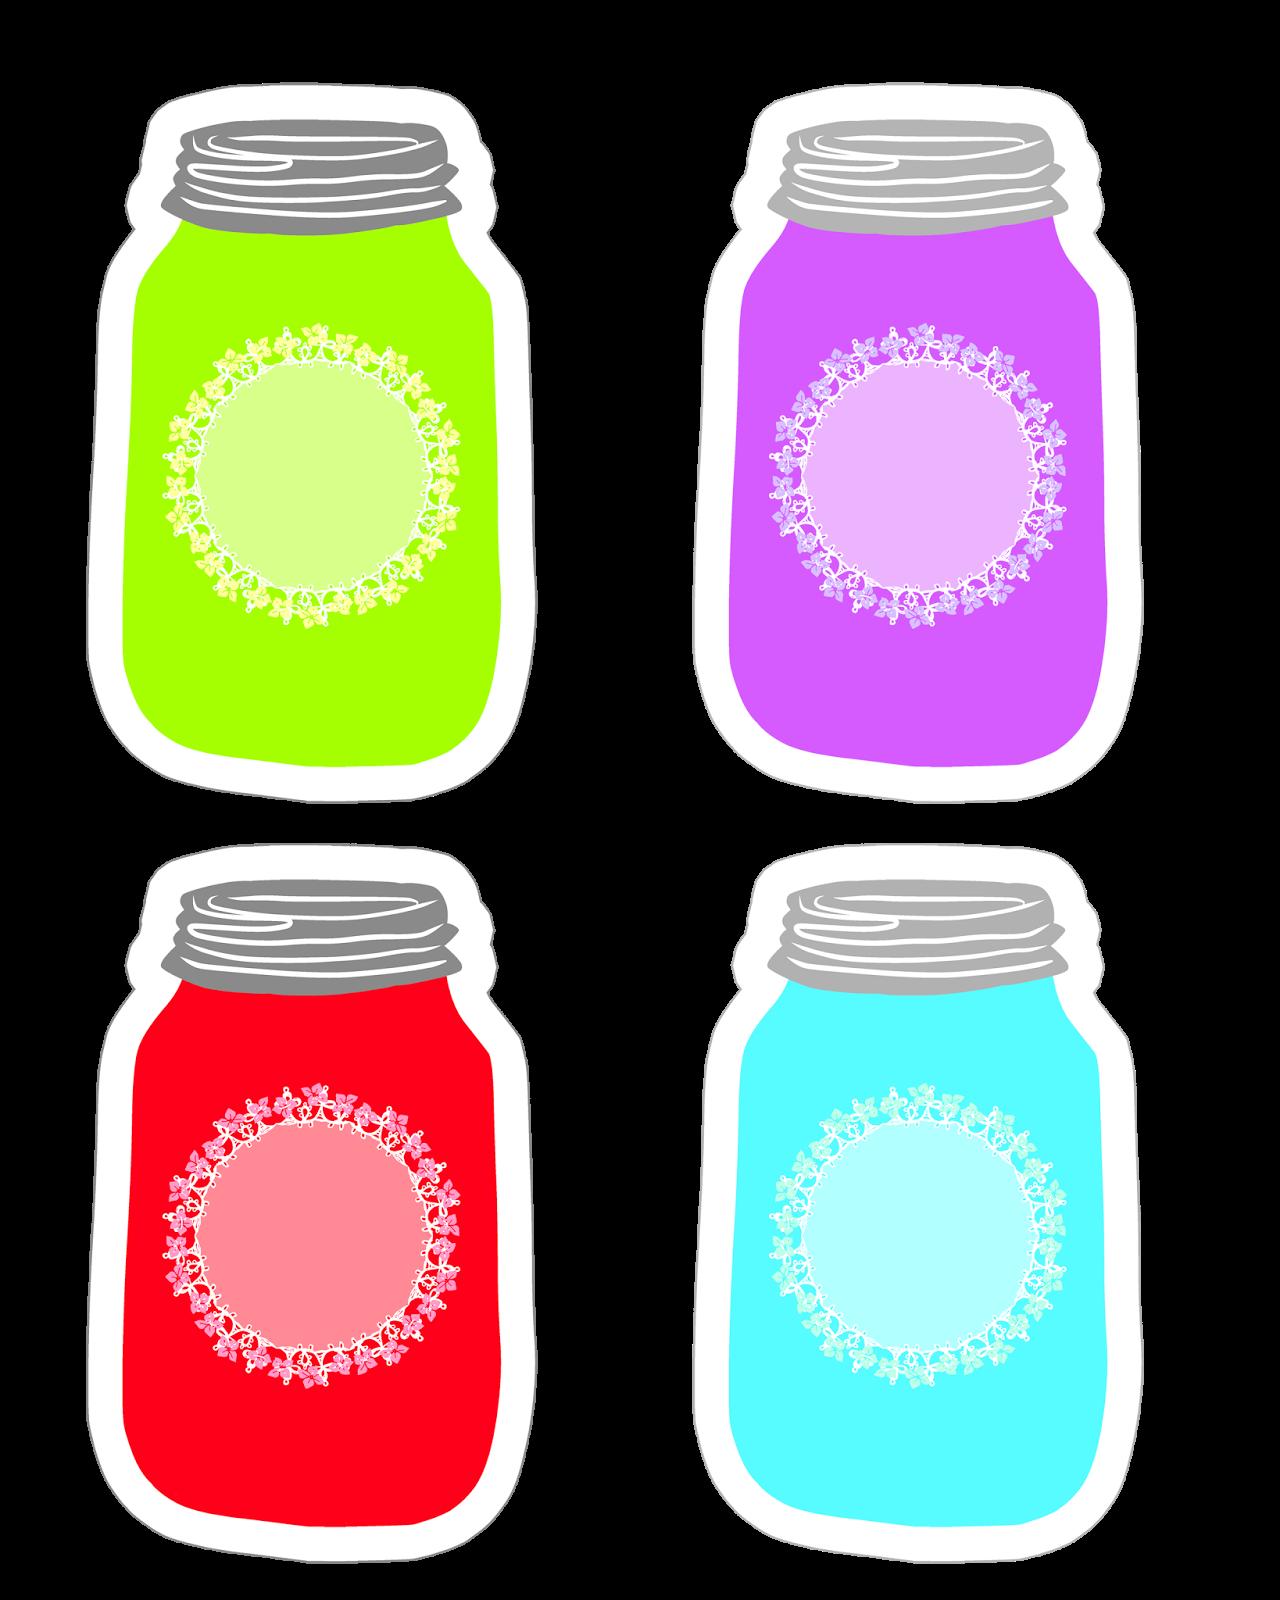 picture transparent download Colorful mason tag collection. Bottle clipart glass jar